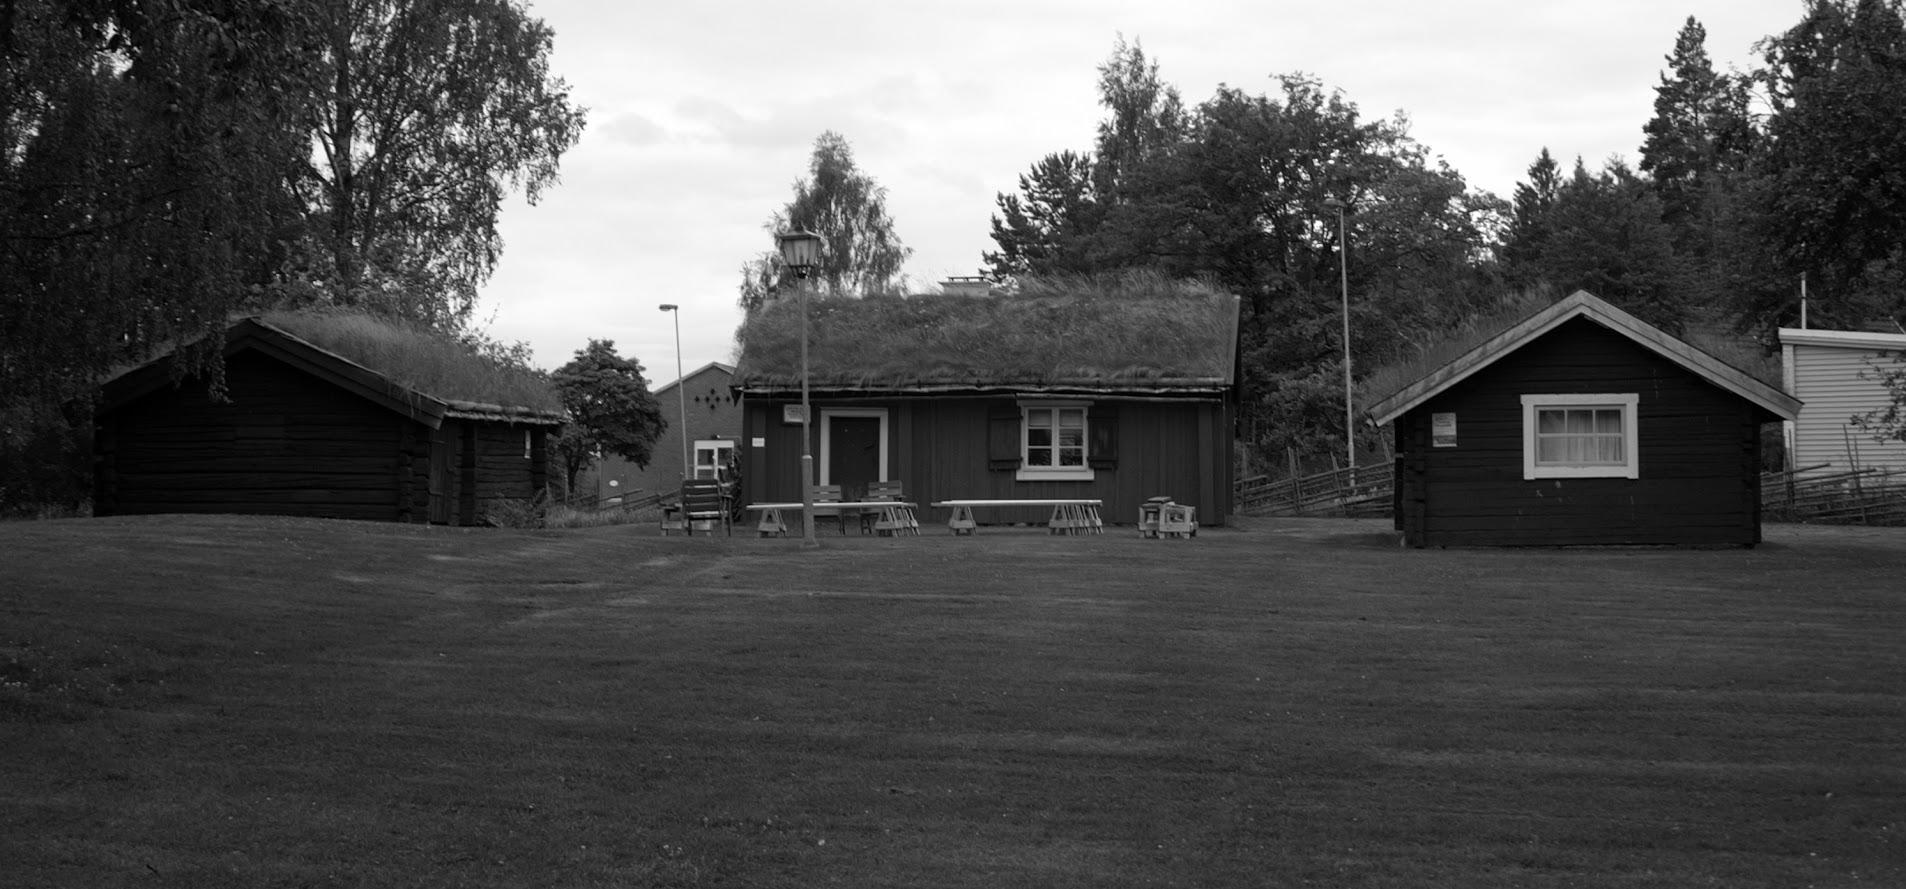 Hönor & Svärmeri 2016